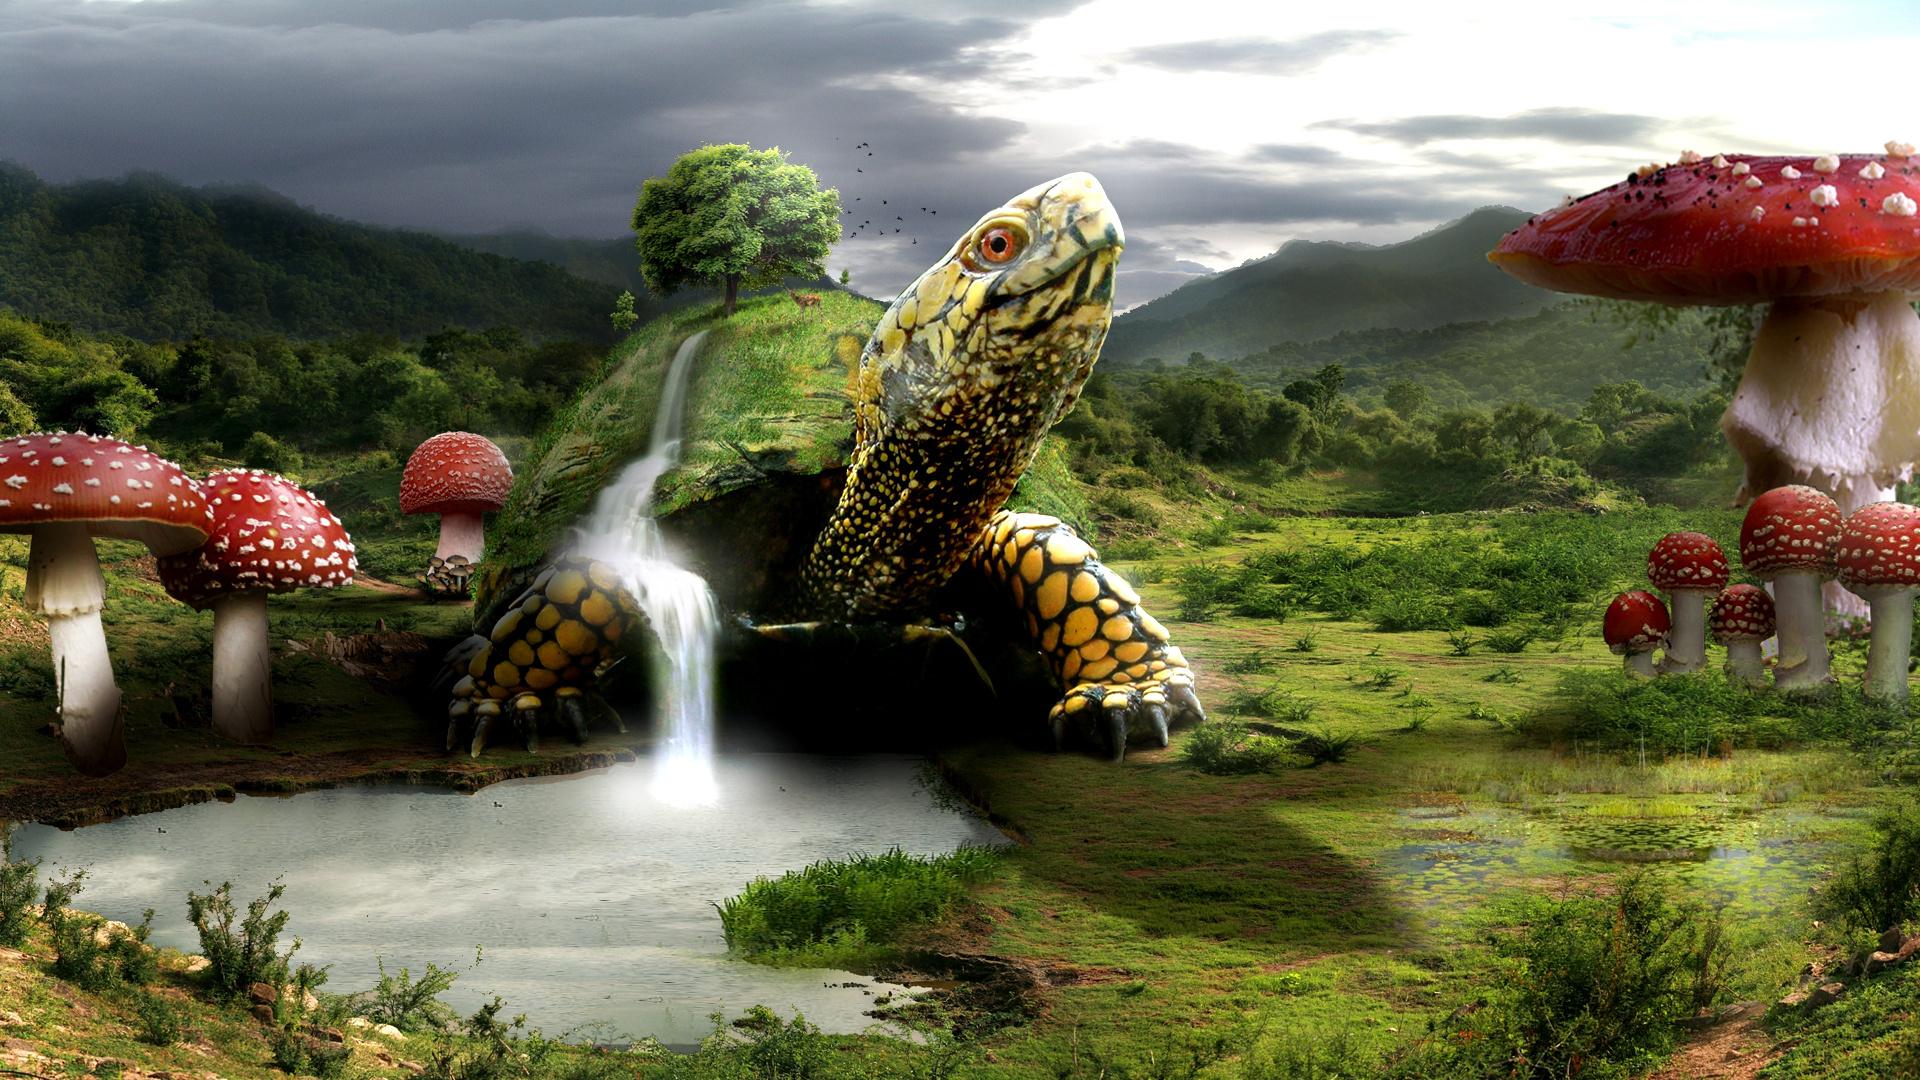 Wallpaper 1920x1080 Px Landscape Mushroom Turtle